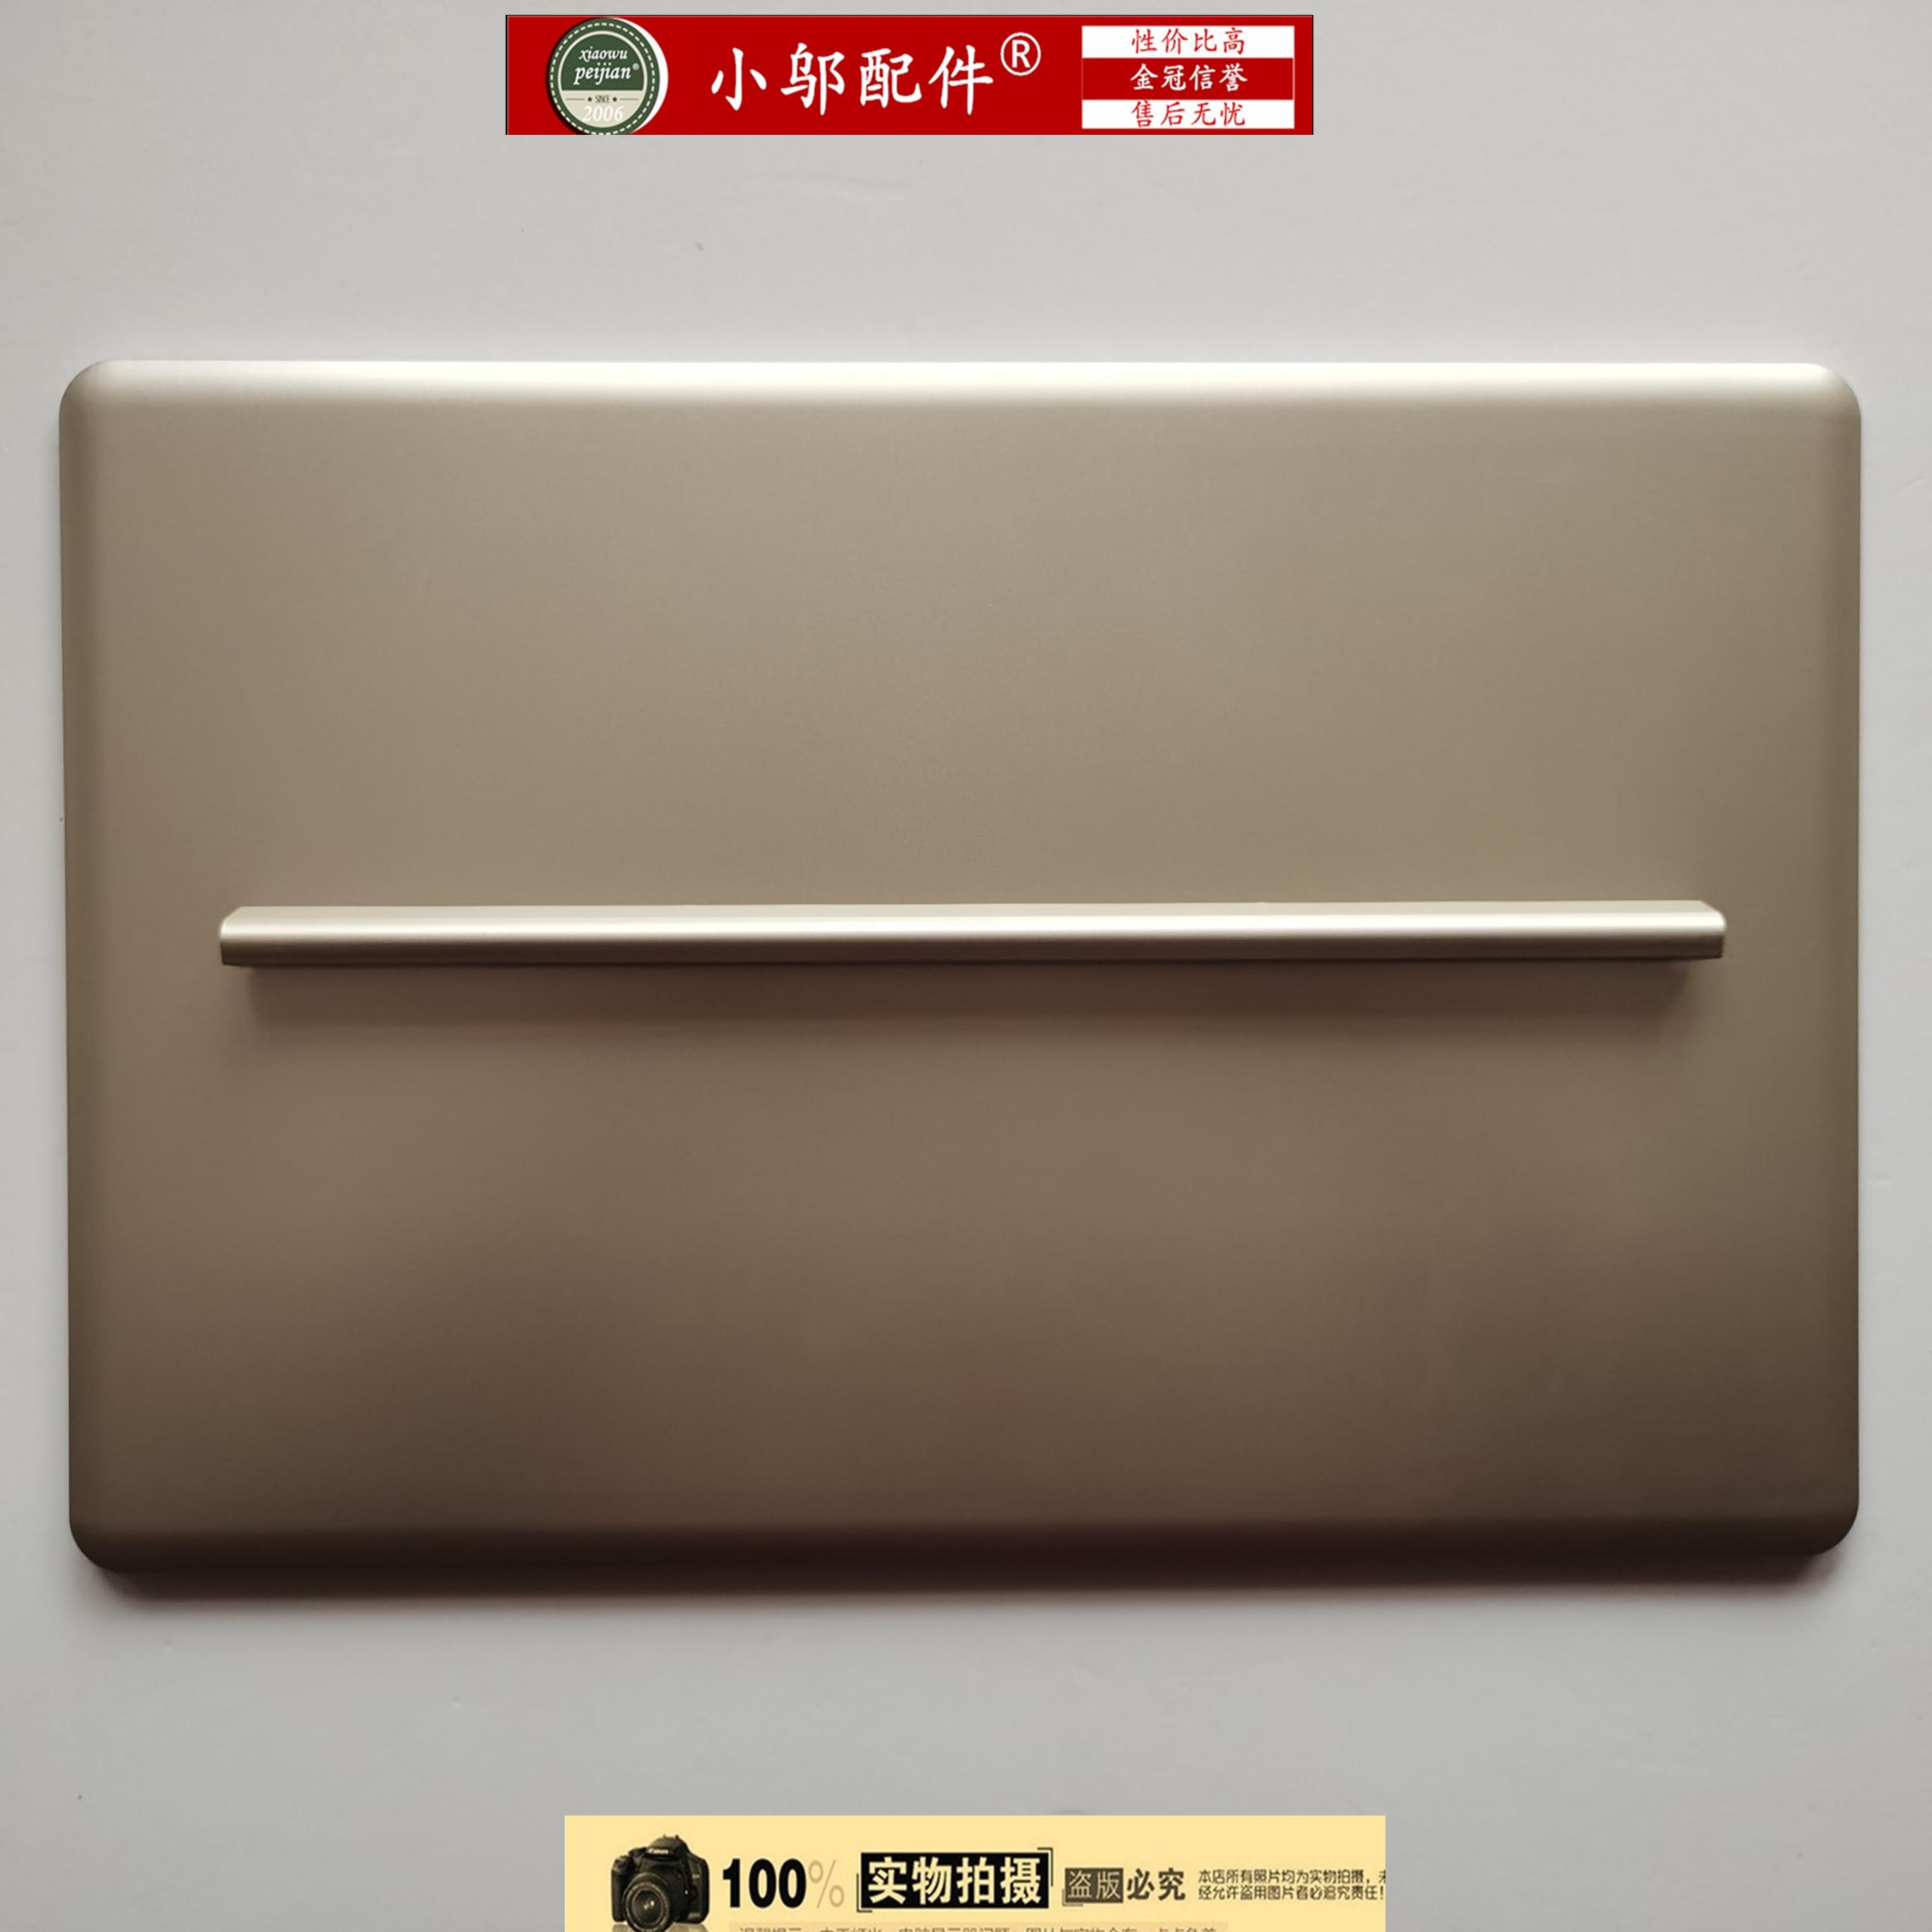 適用ASUS S510 X510 X510UA A510 F510 X510UQ UN A殼屏軸蓋屏軸